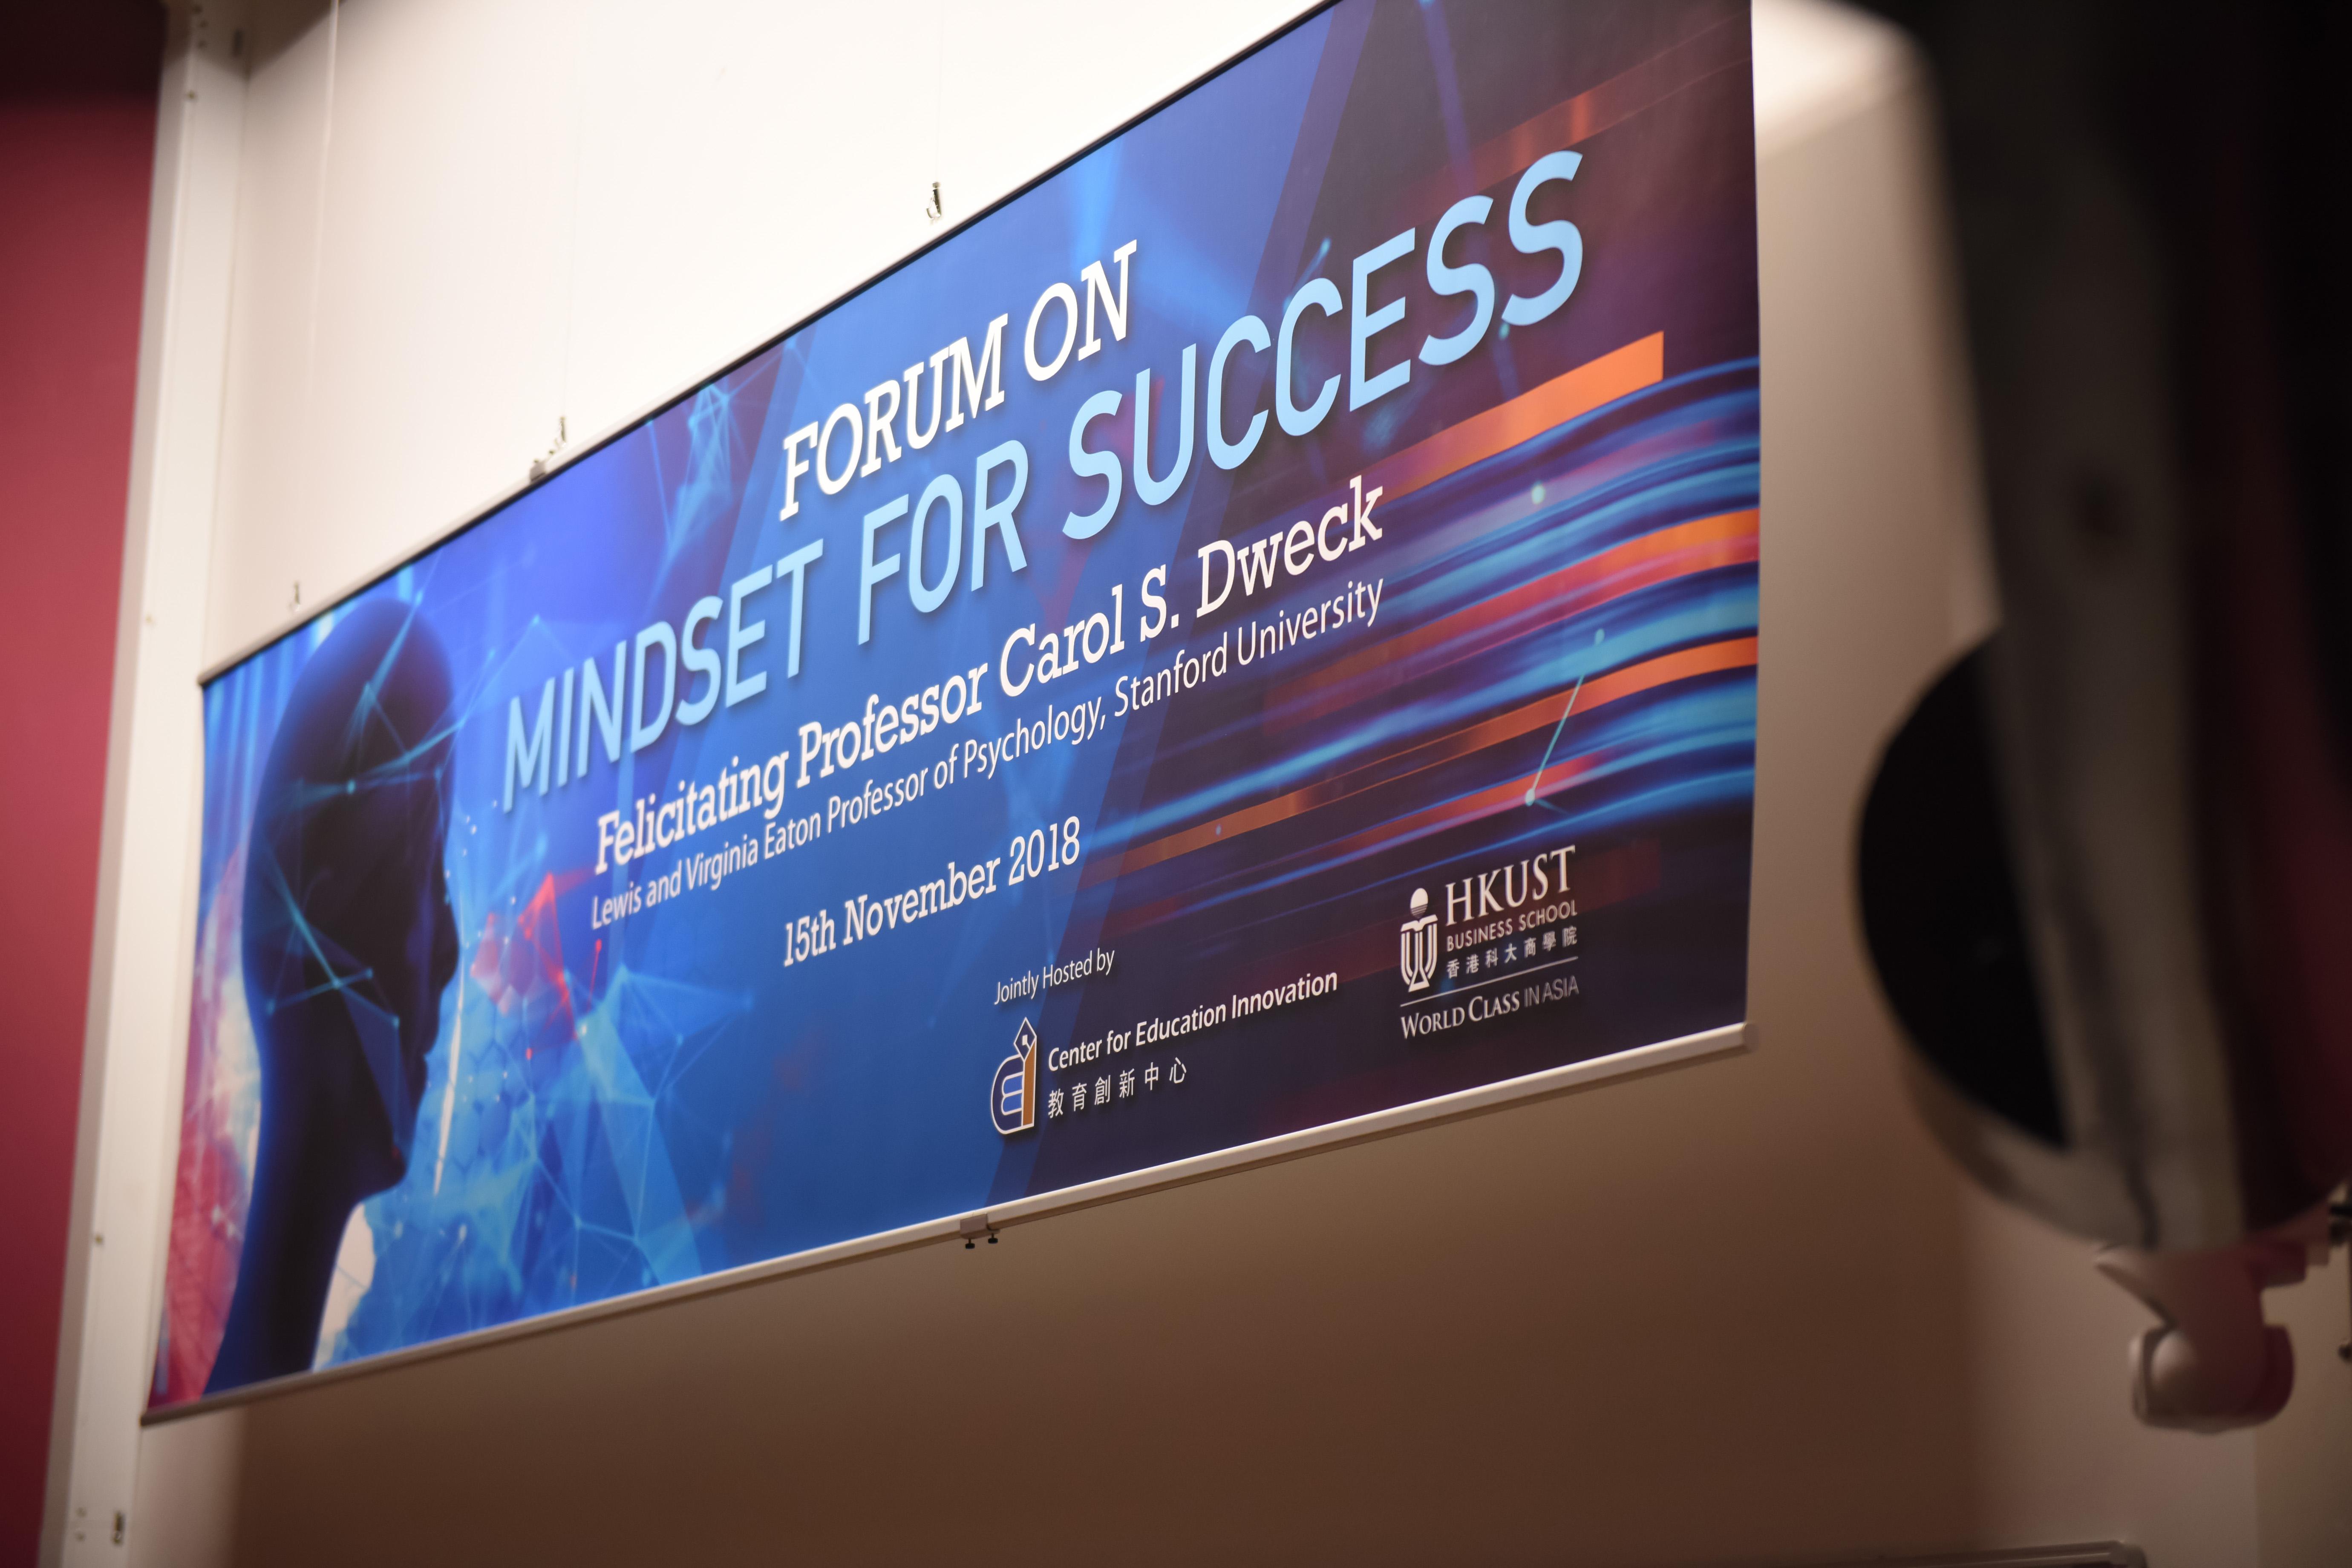 MINDSET FOR SUCCESS FORUM